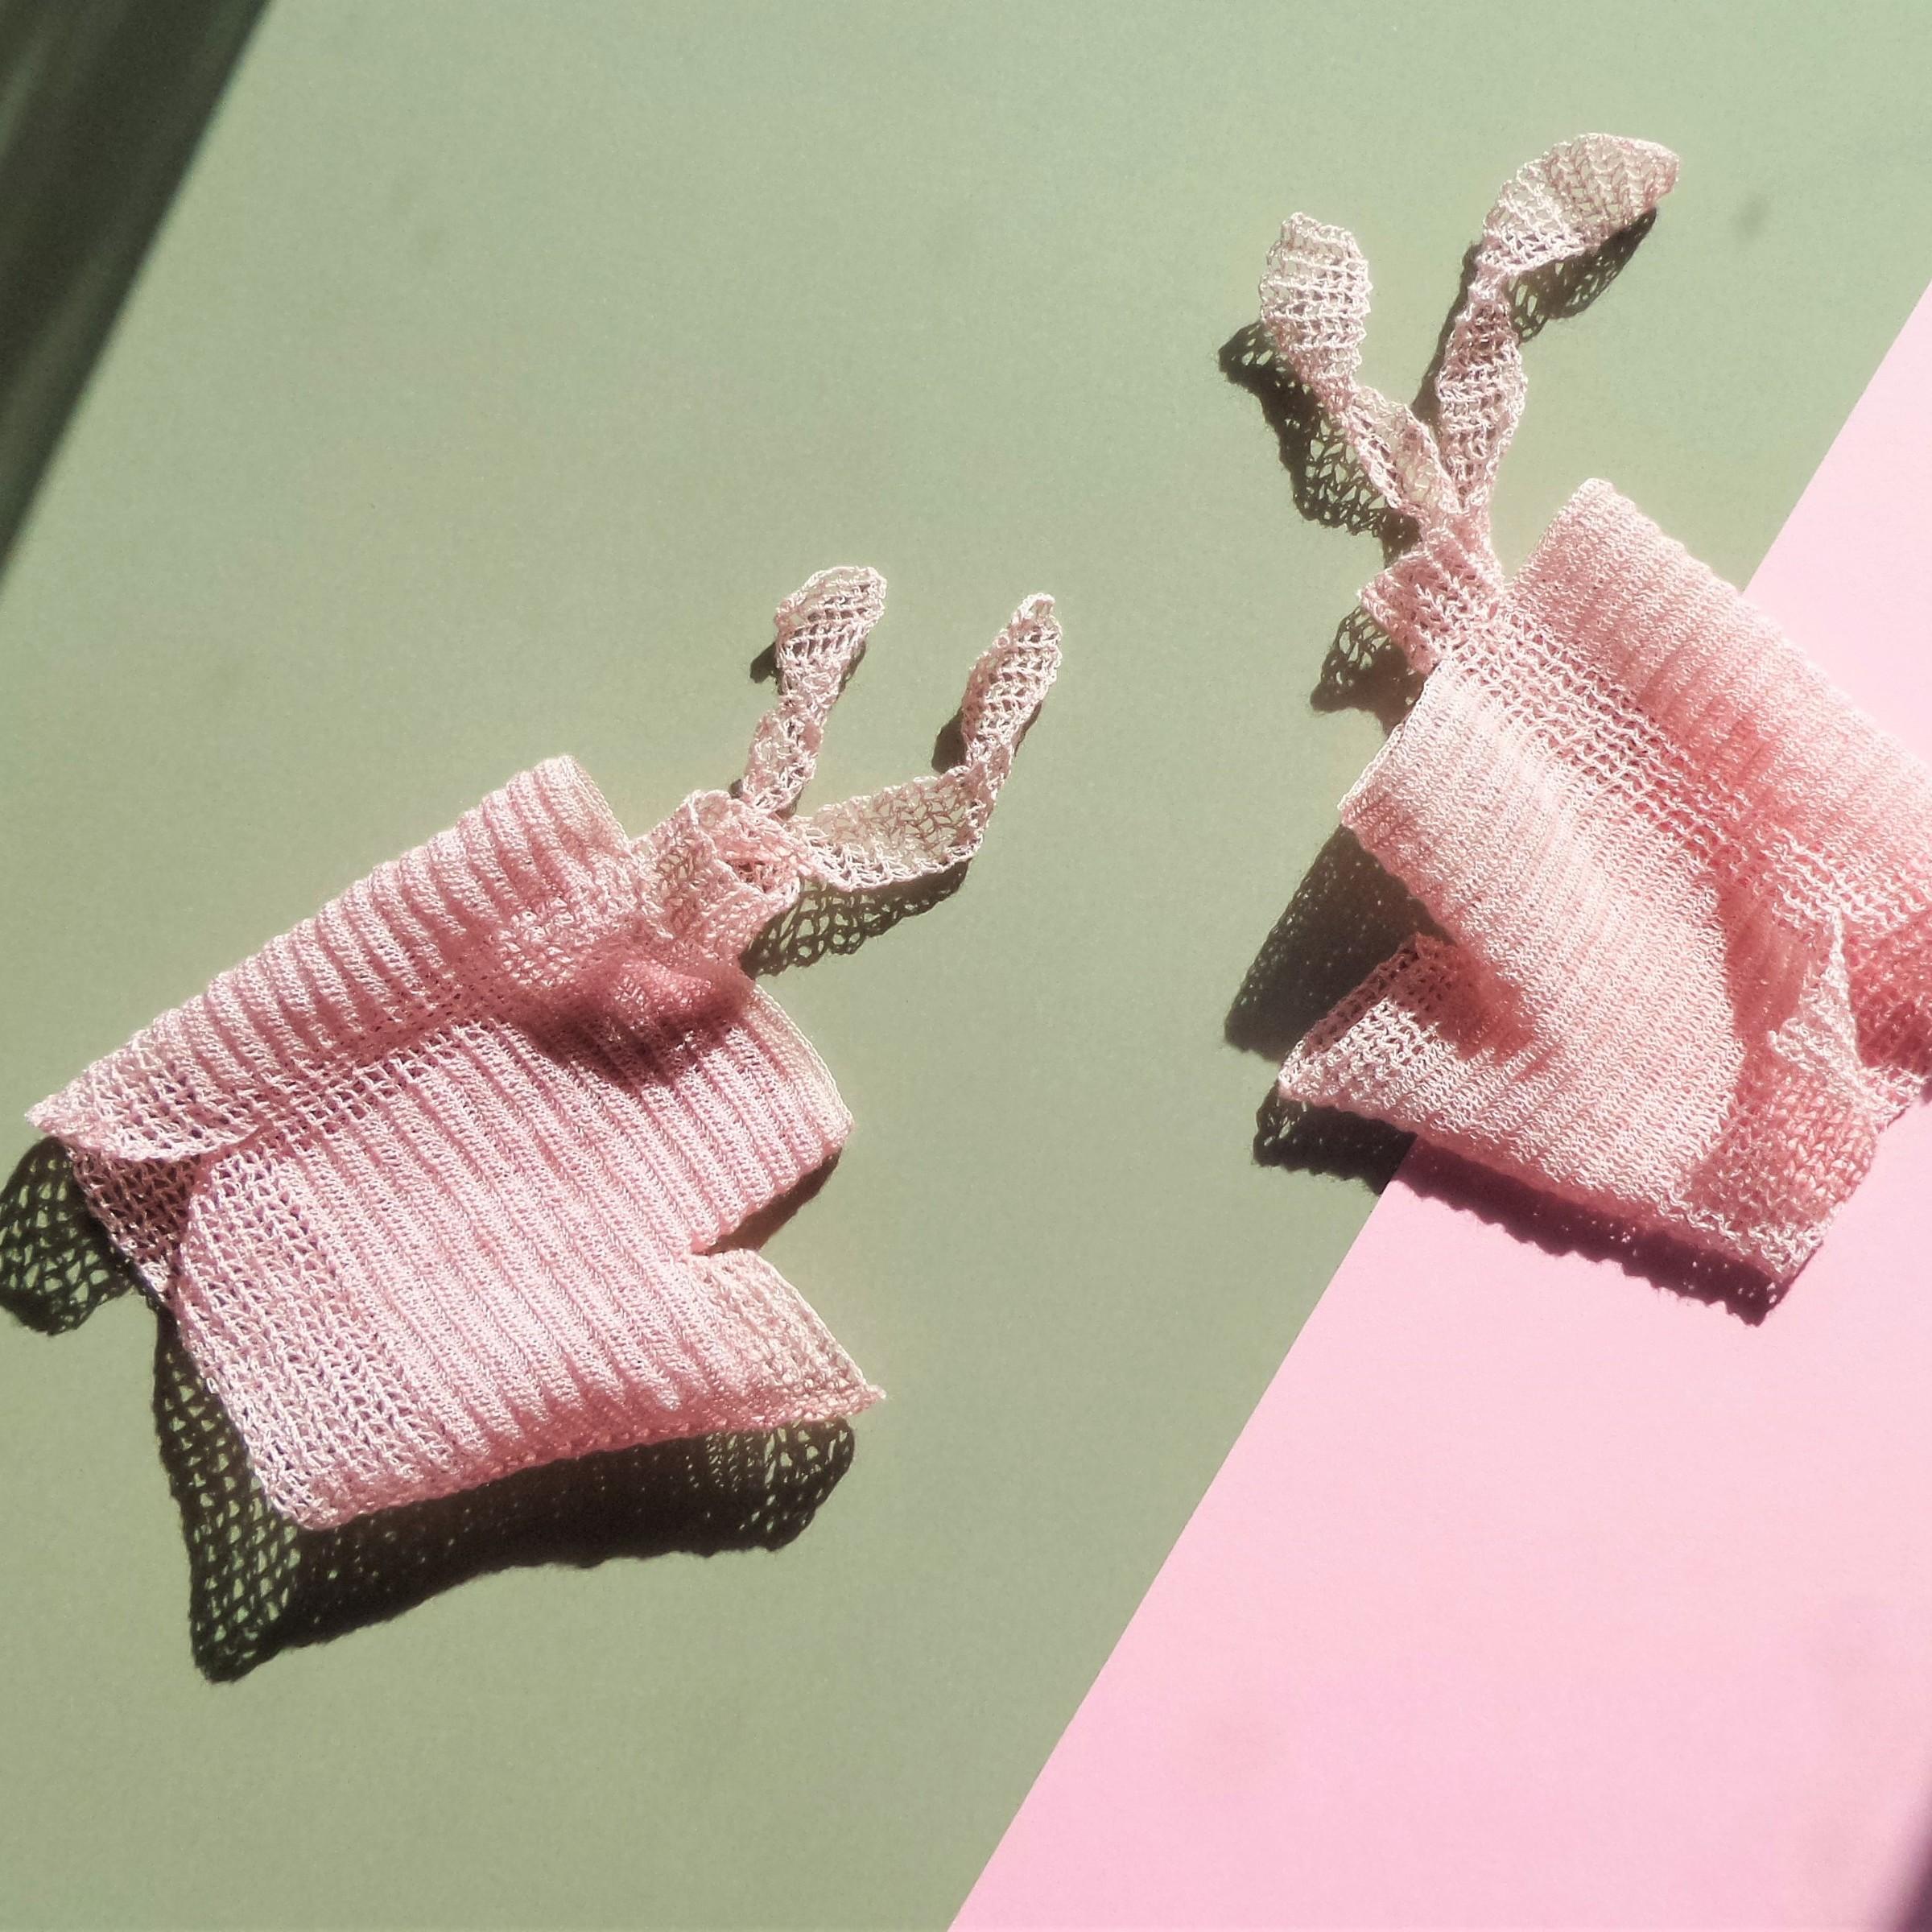 Flying ribbons palepink spring fashiongloves